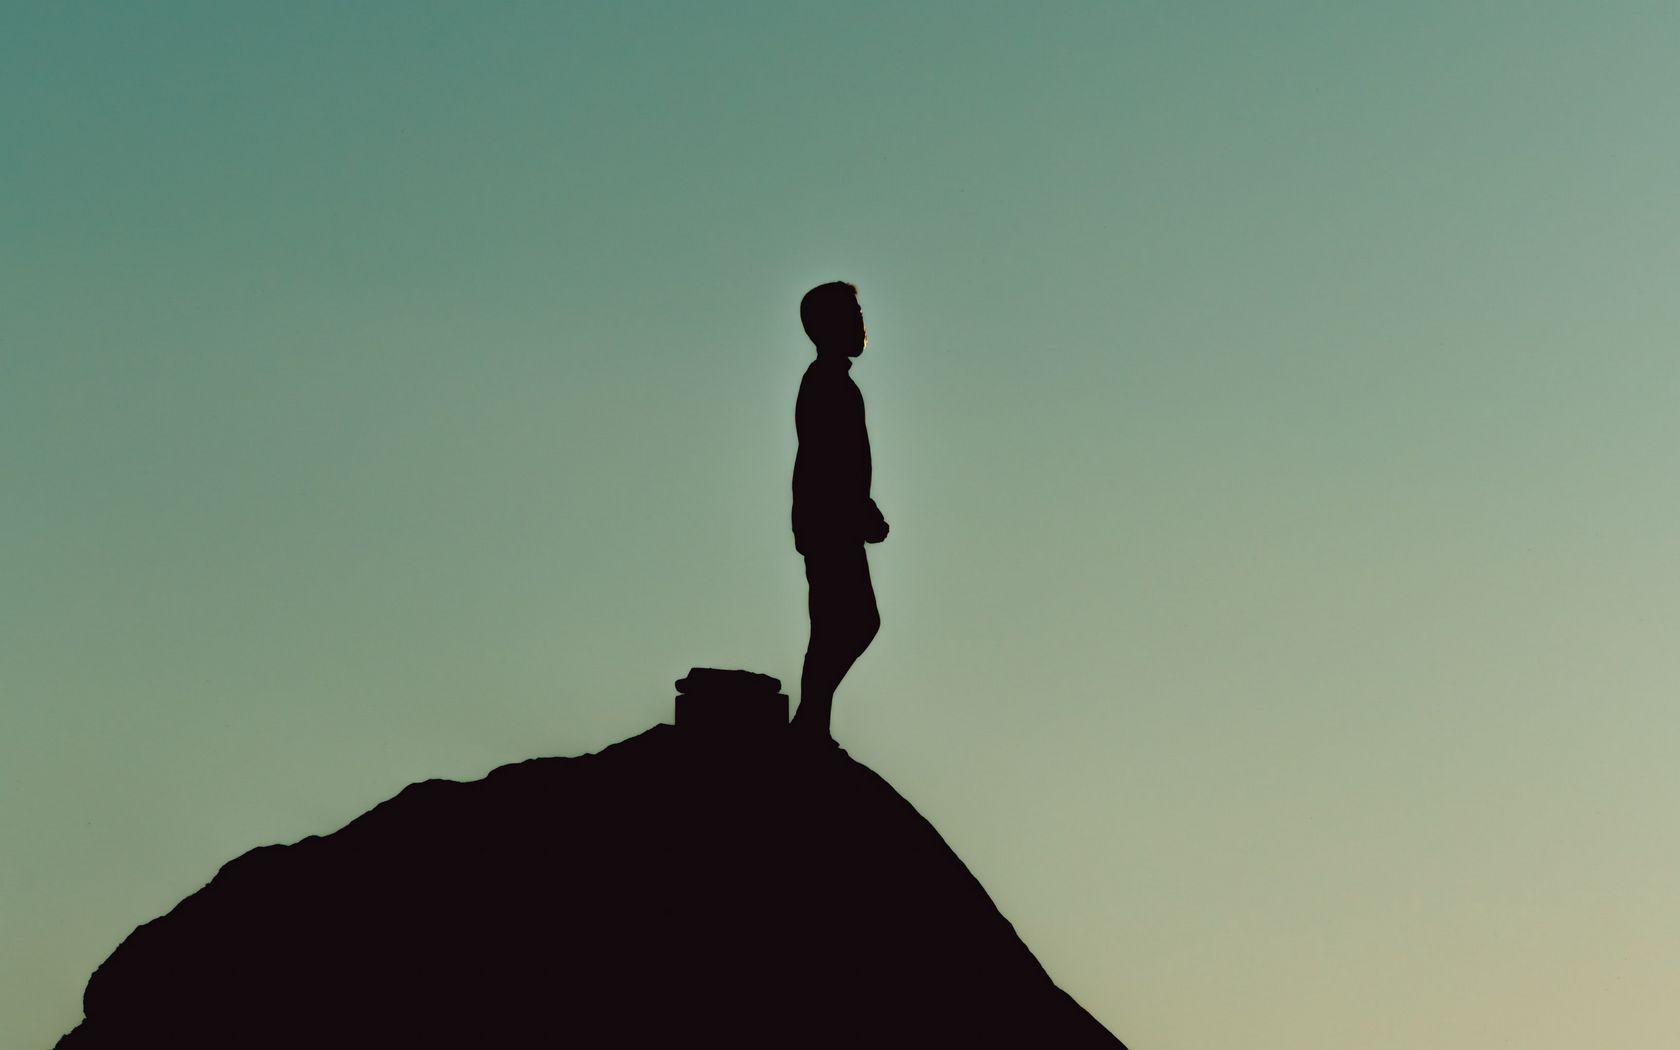 1680x1050 Wallpaper silhouette, alone, mountain, twilight, dark